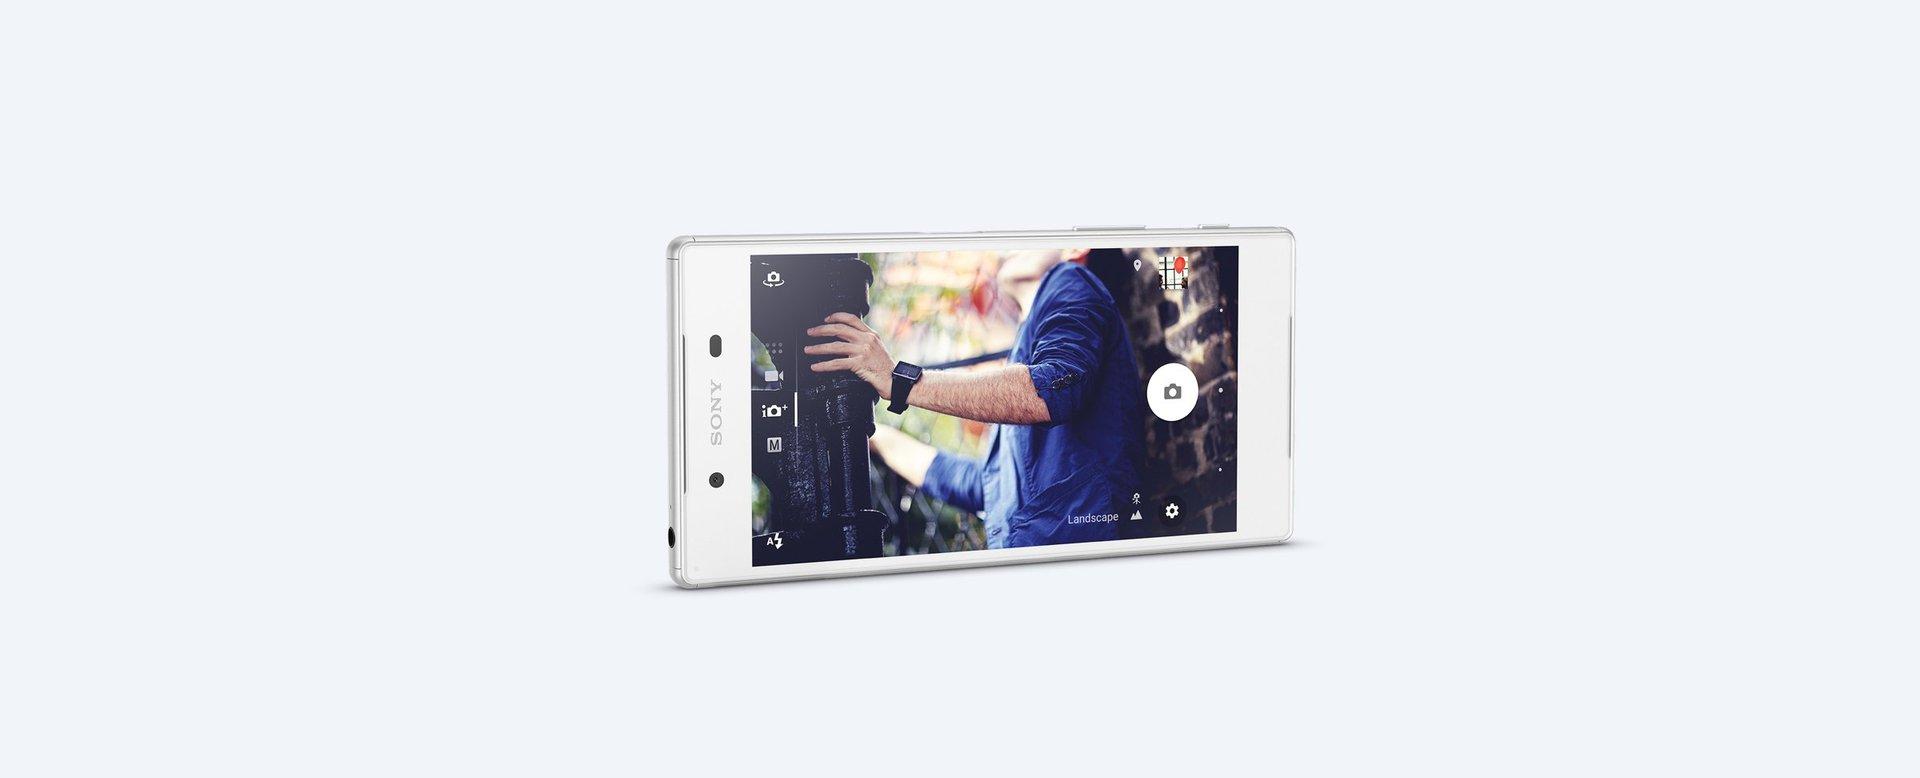 Xperia Z5, Z5 Compact и Z5 Premium. Первые подробности - 2